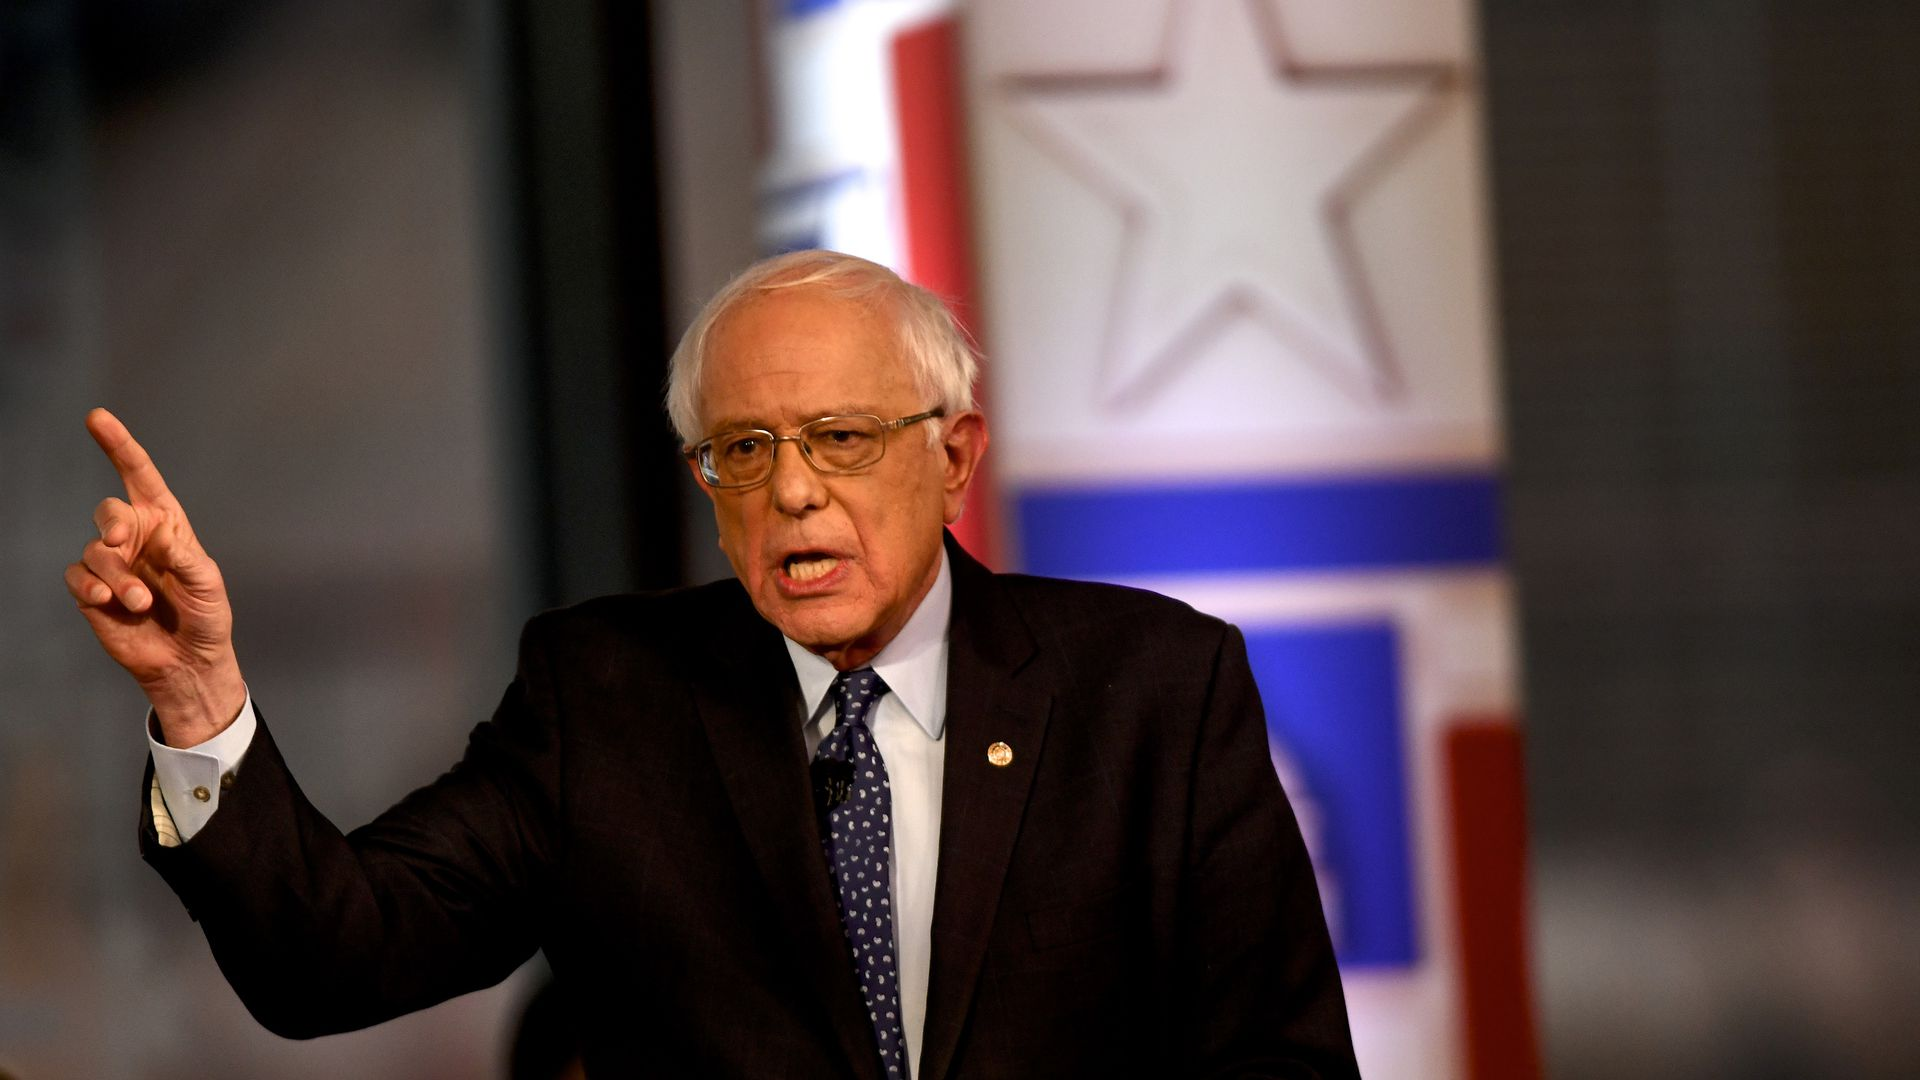 Bernie Sanders agrees with President Trump on North Korea